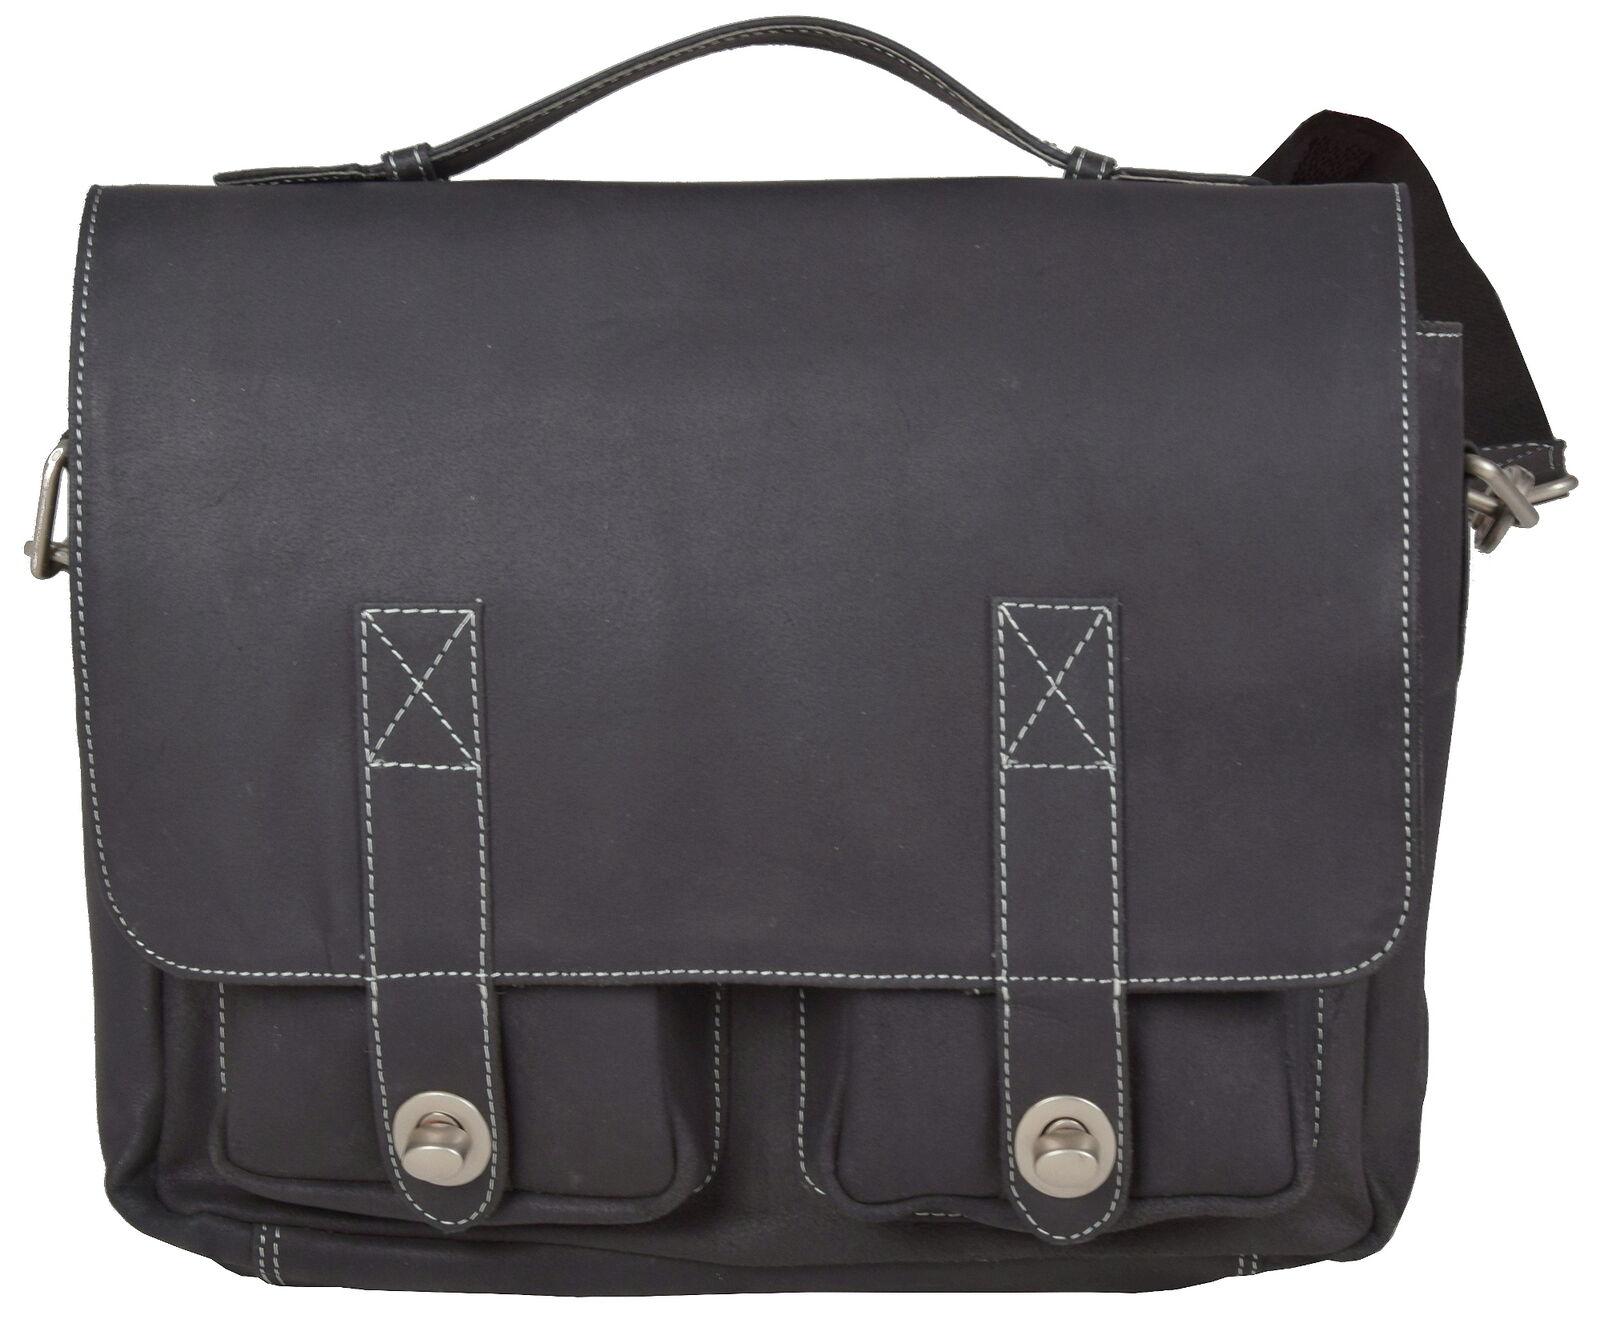 Echt Leder Messenger Bag Handtasche Groß Aktentasche Umhängetasche Unisex Grau